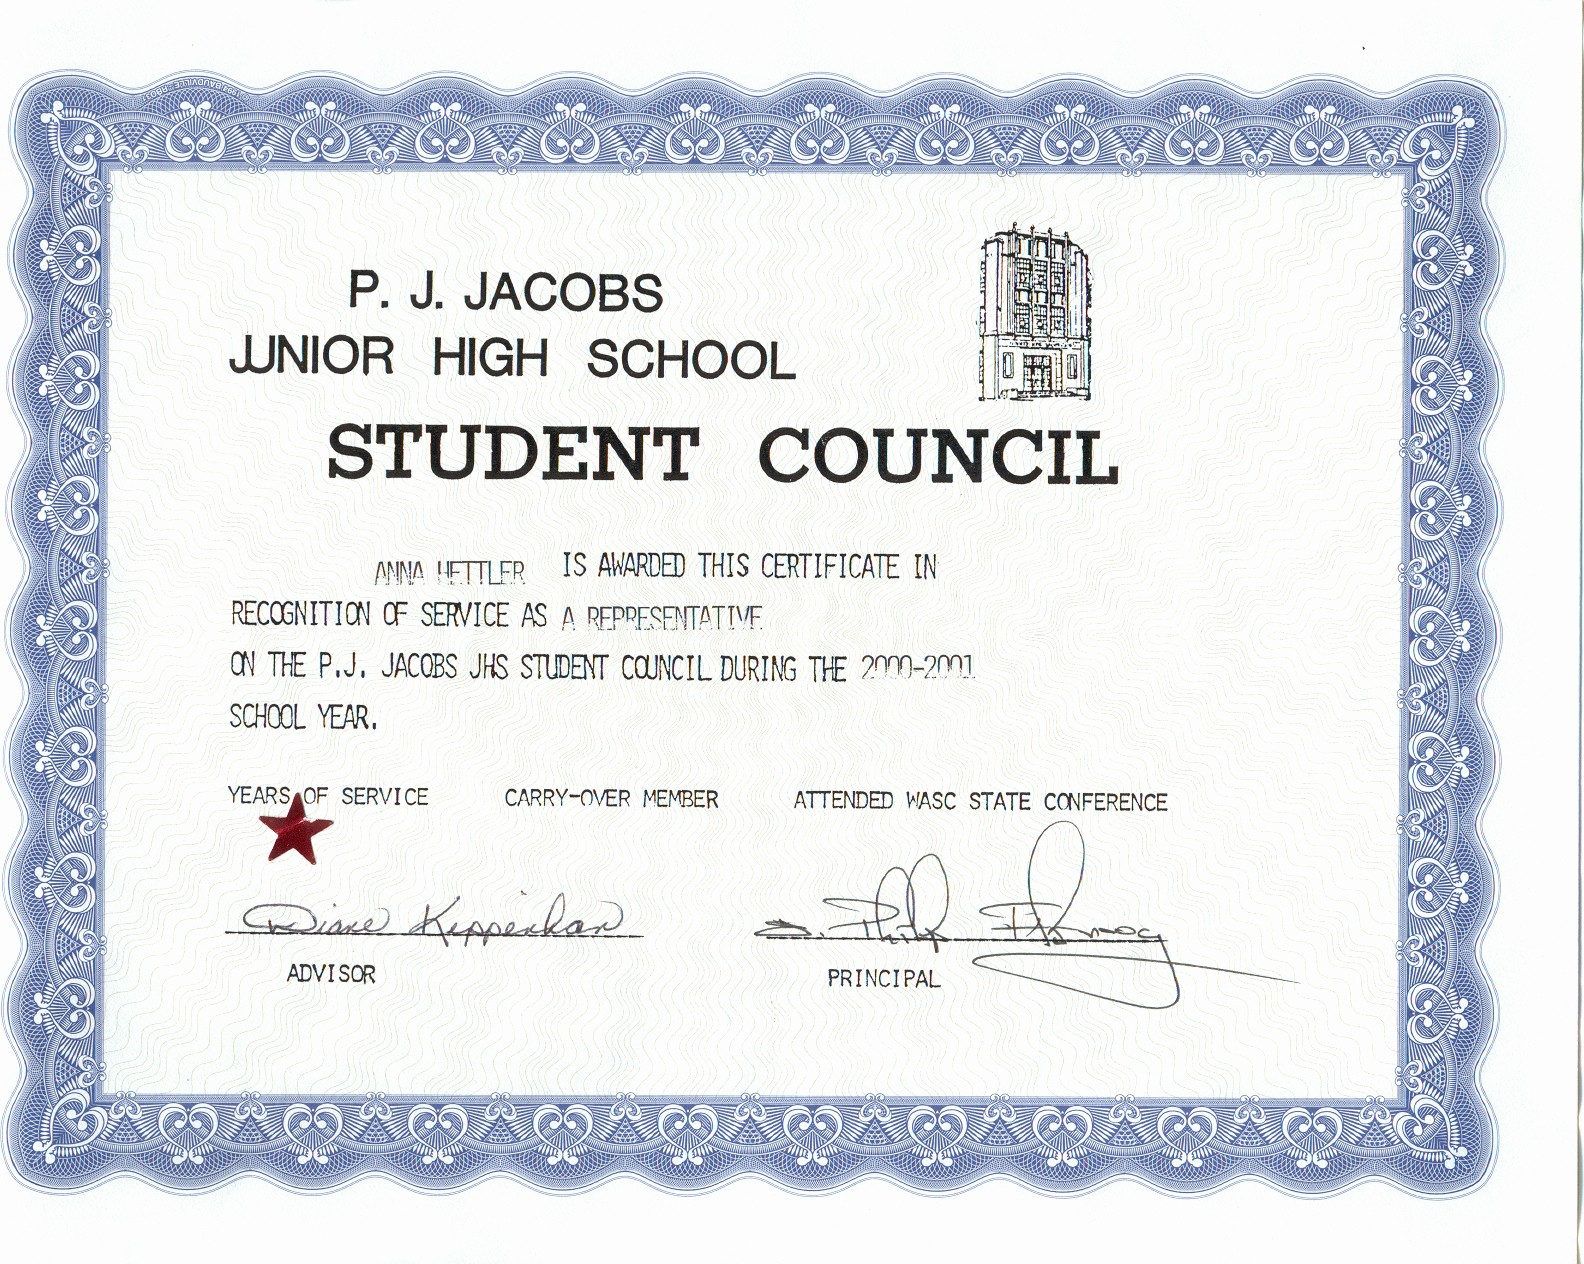 Student Council Award Certificate Template Unique Student Council Award Certificates Christopherbathum